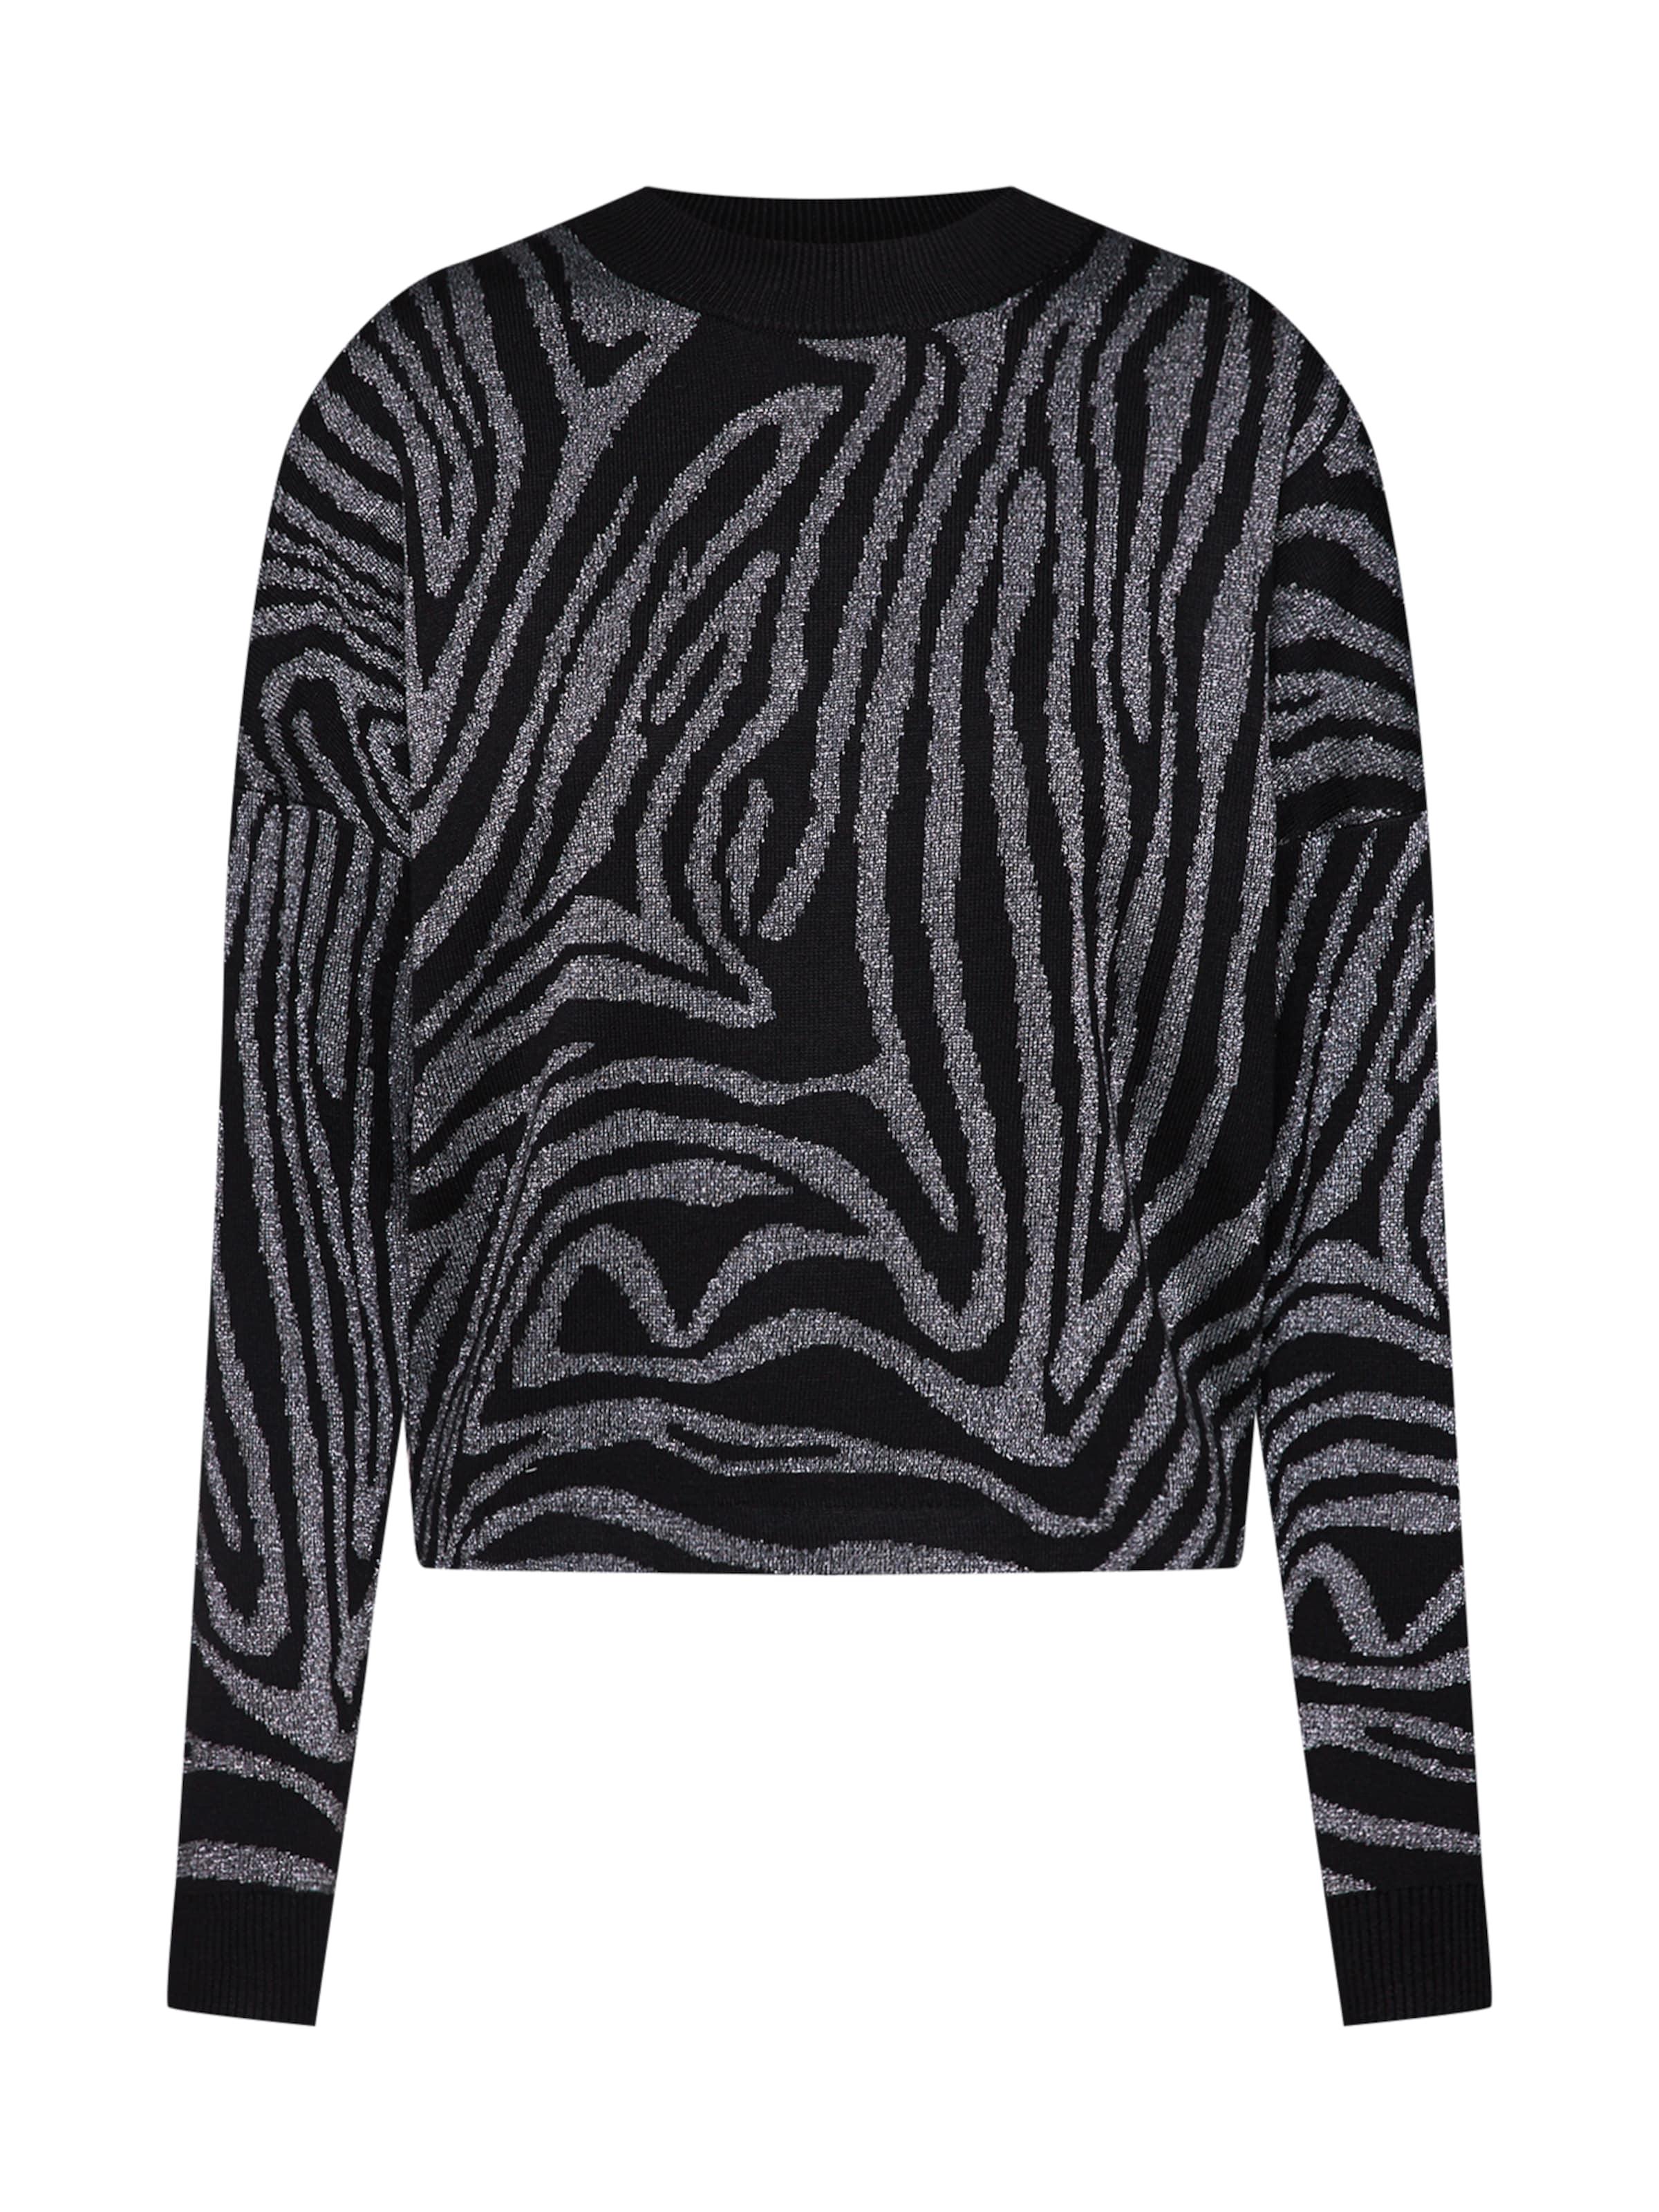 Mint Pull Jumper' Print En 'zebra Lurex NoirArgent over amp;berry bYf7yvg6